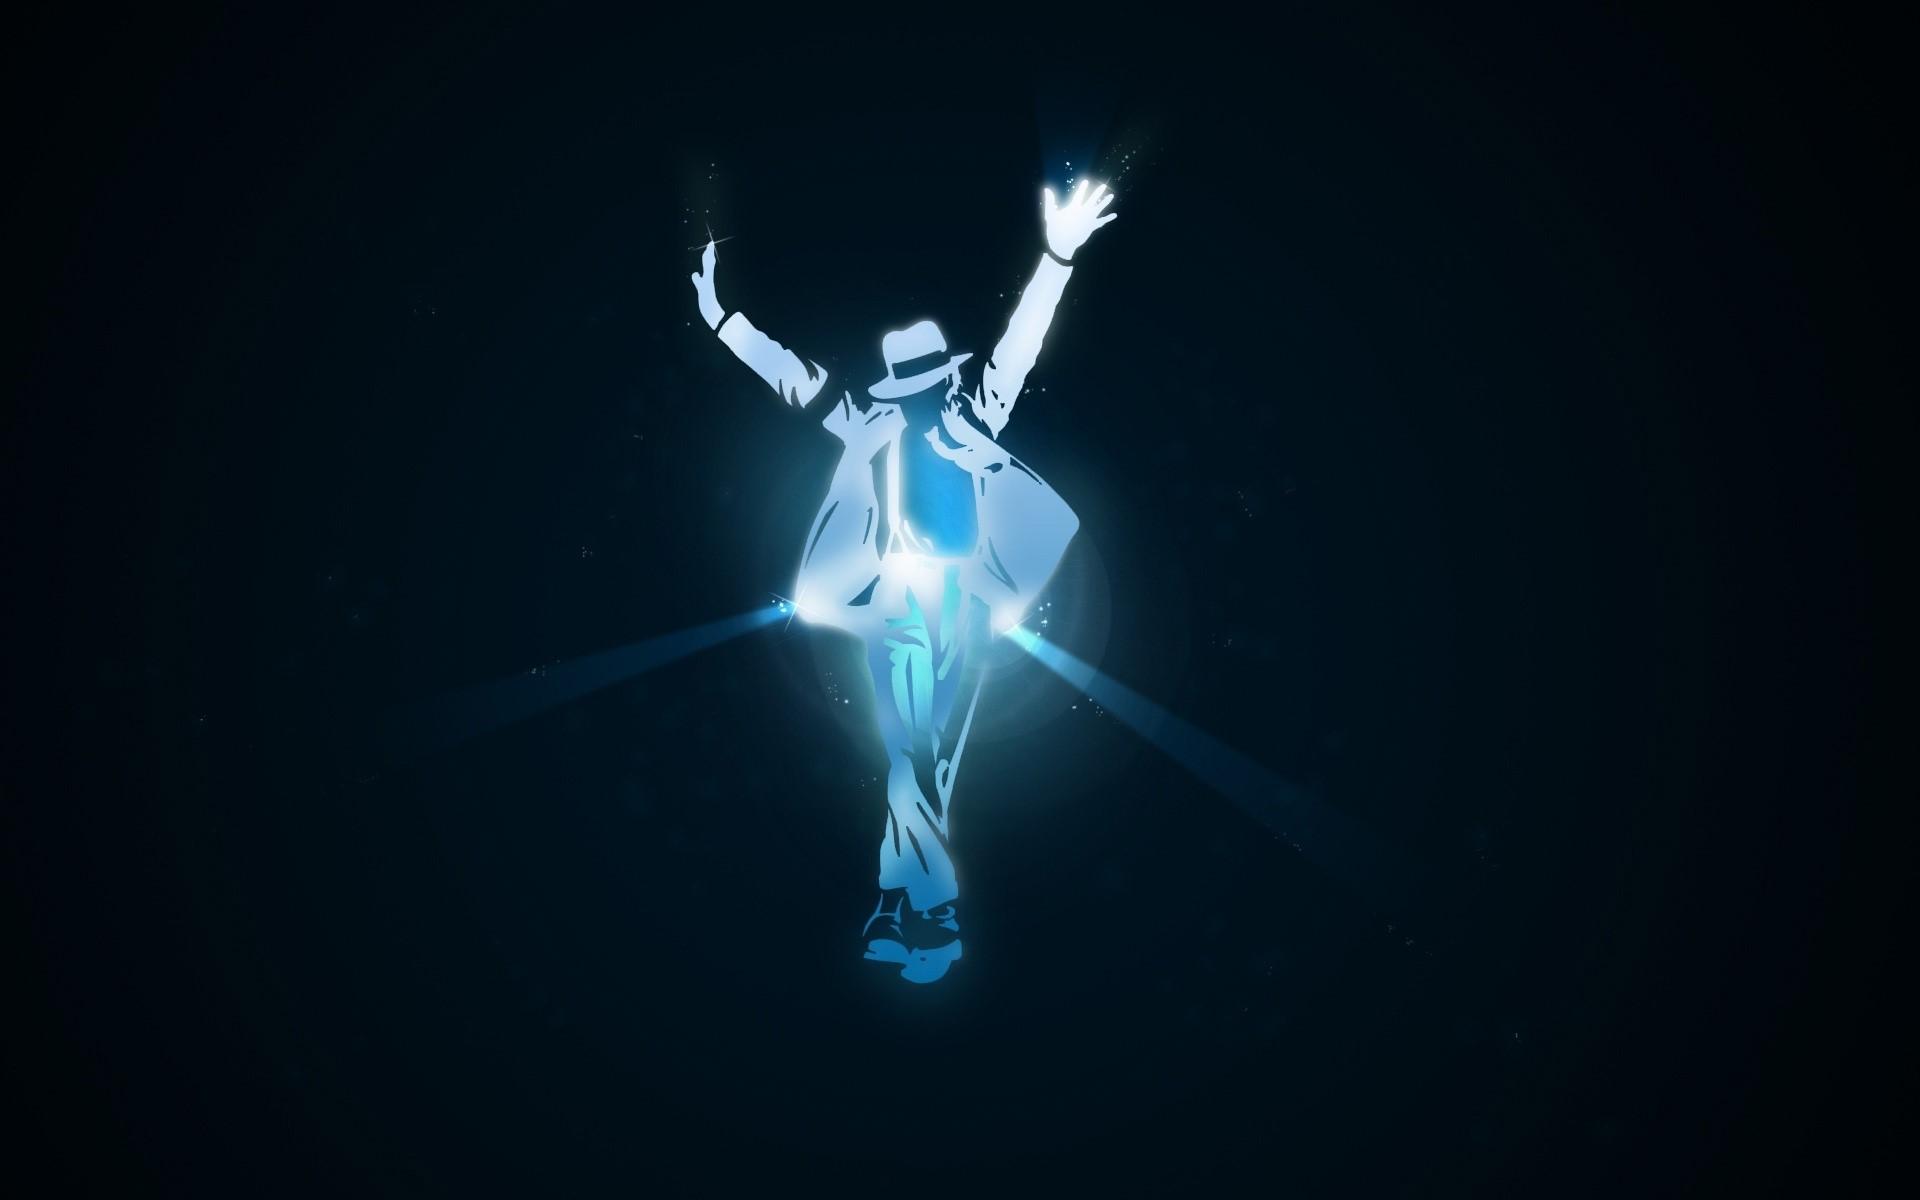 Fondo de pantalla de Michael Jackson en luces Imágenes